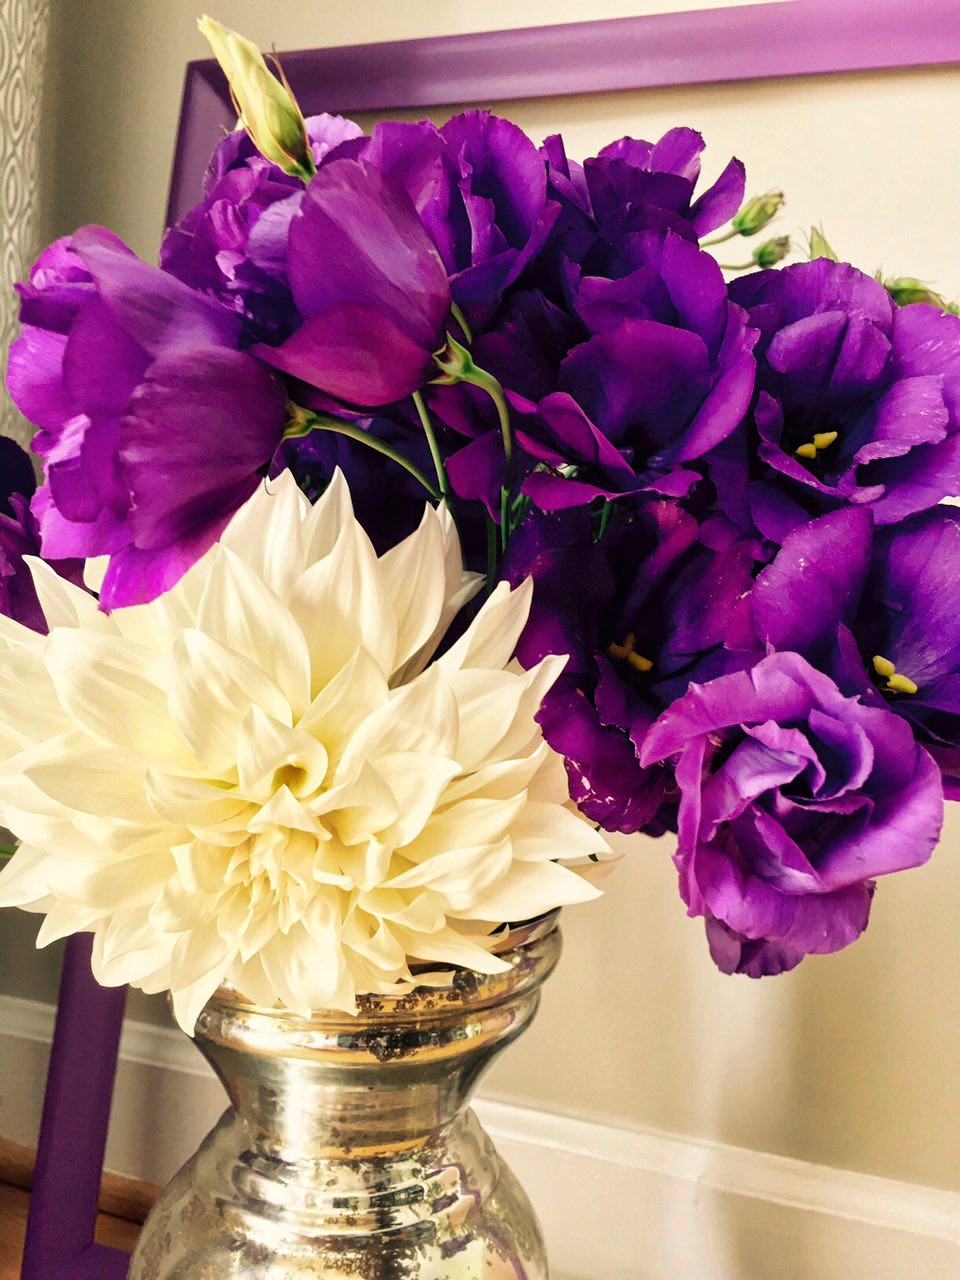 Lot 7 floral.jpeg